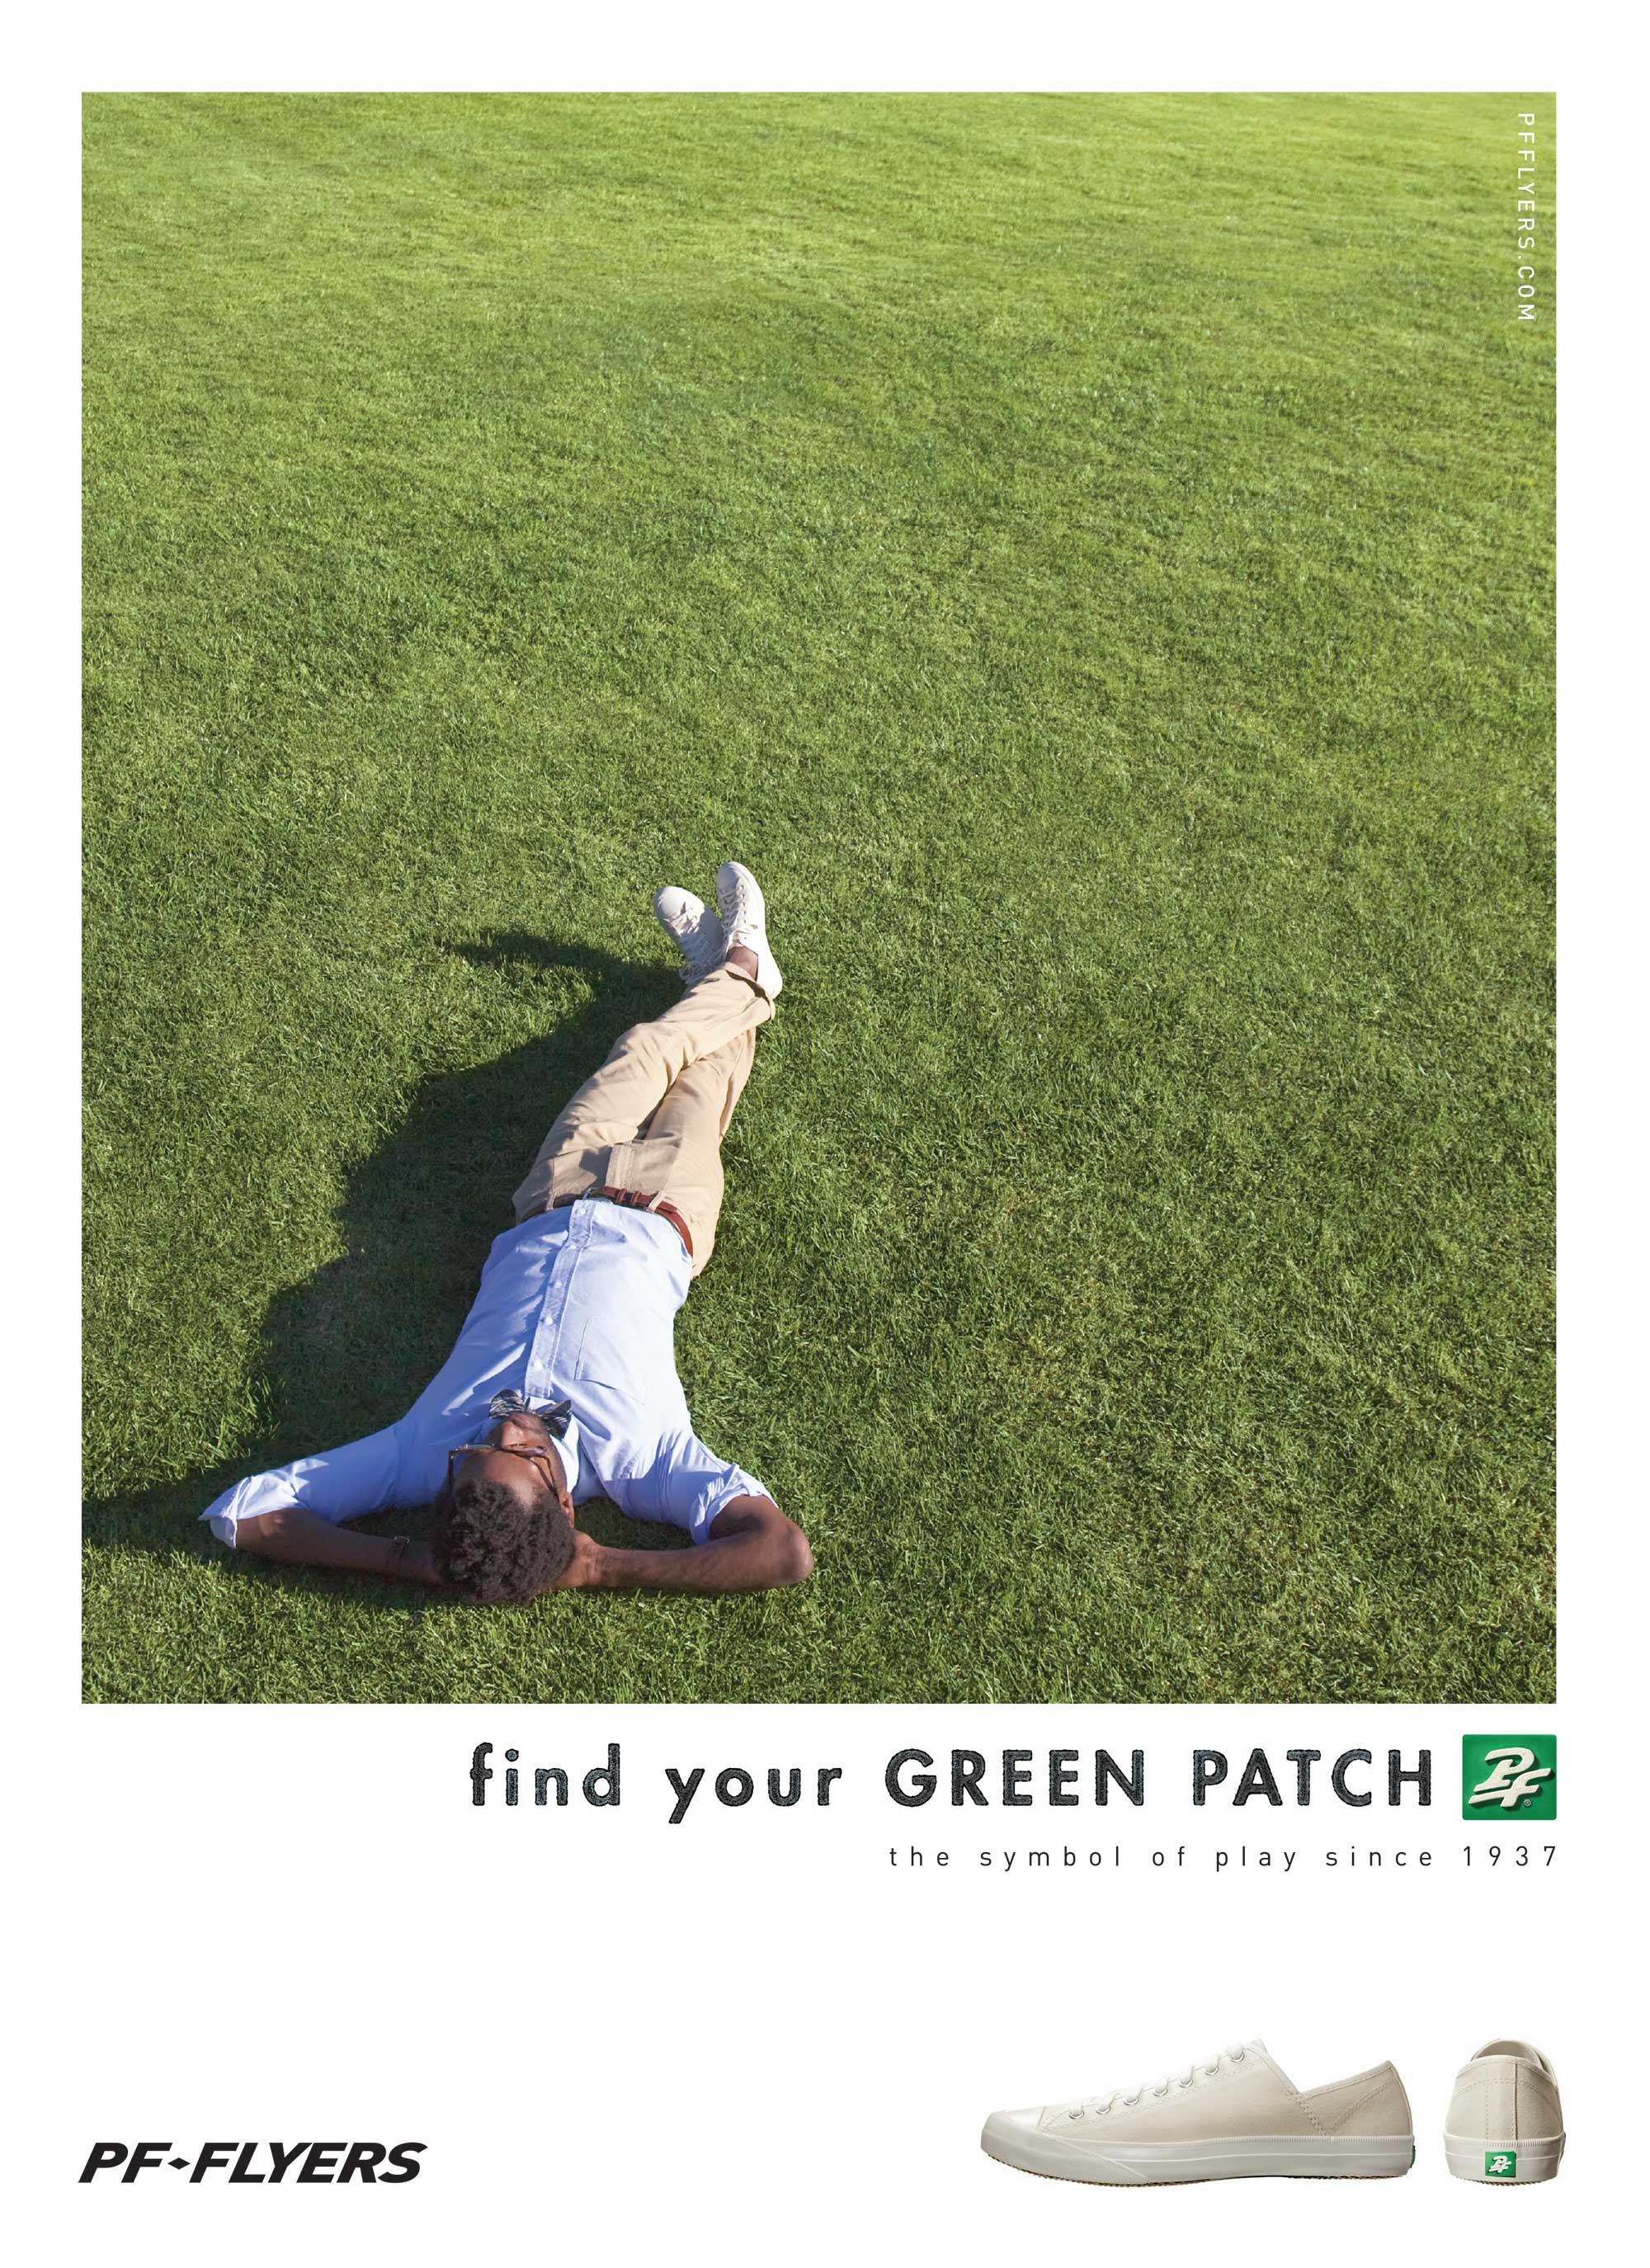 image of PF Flyers print ad